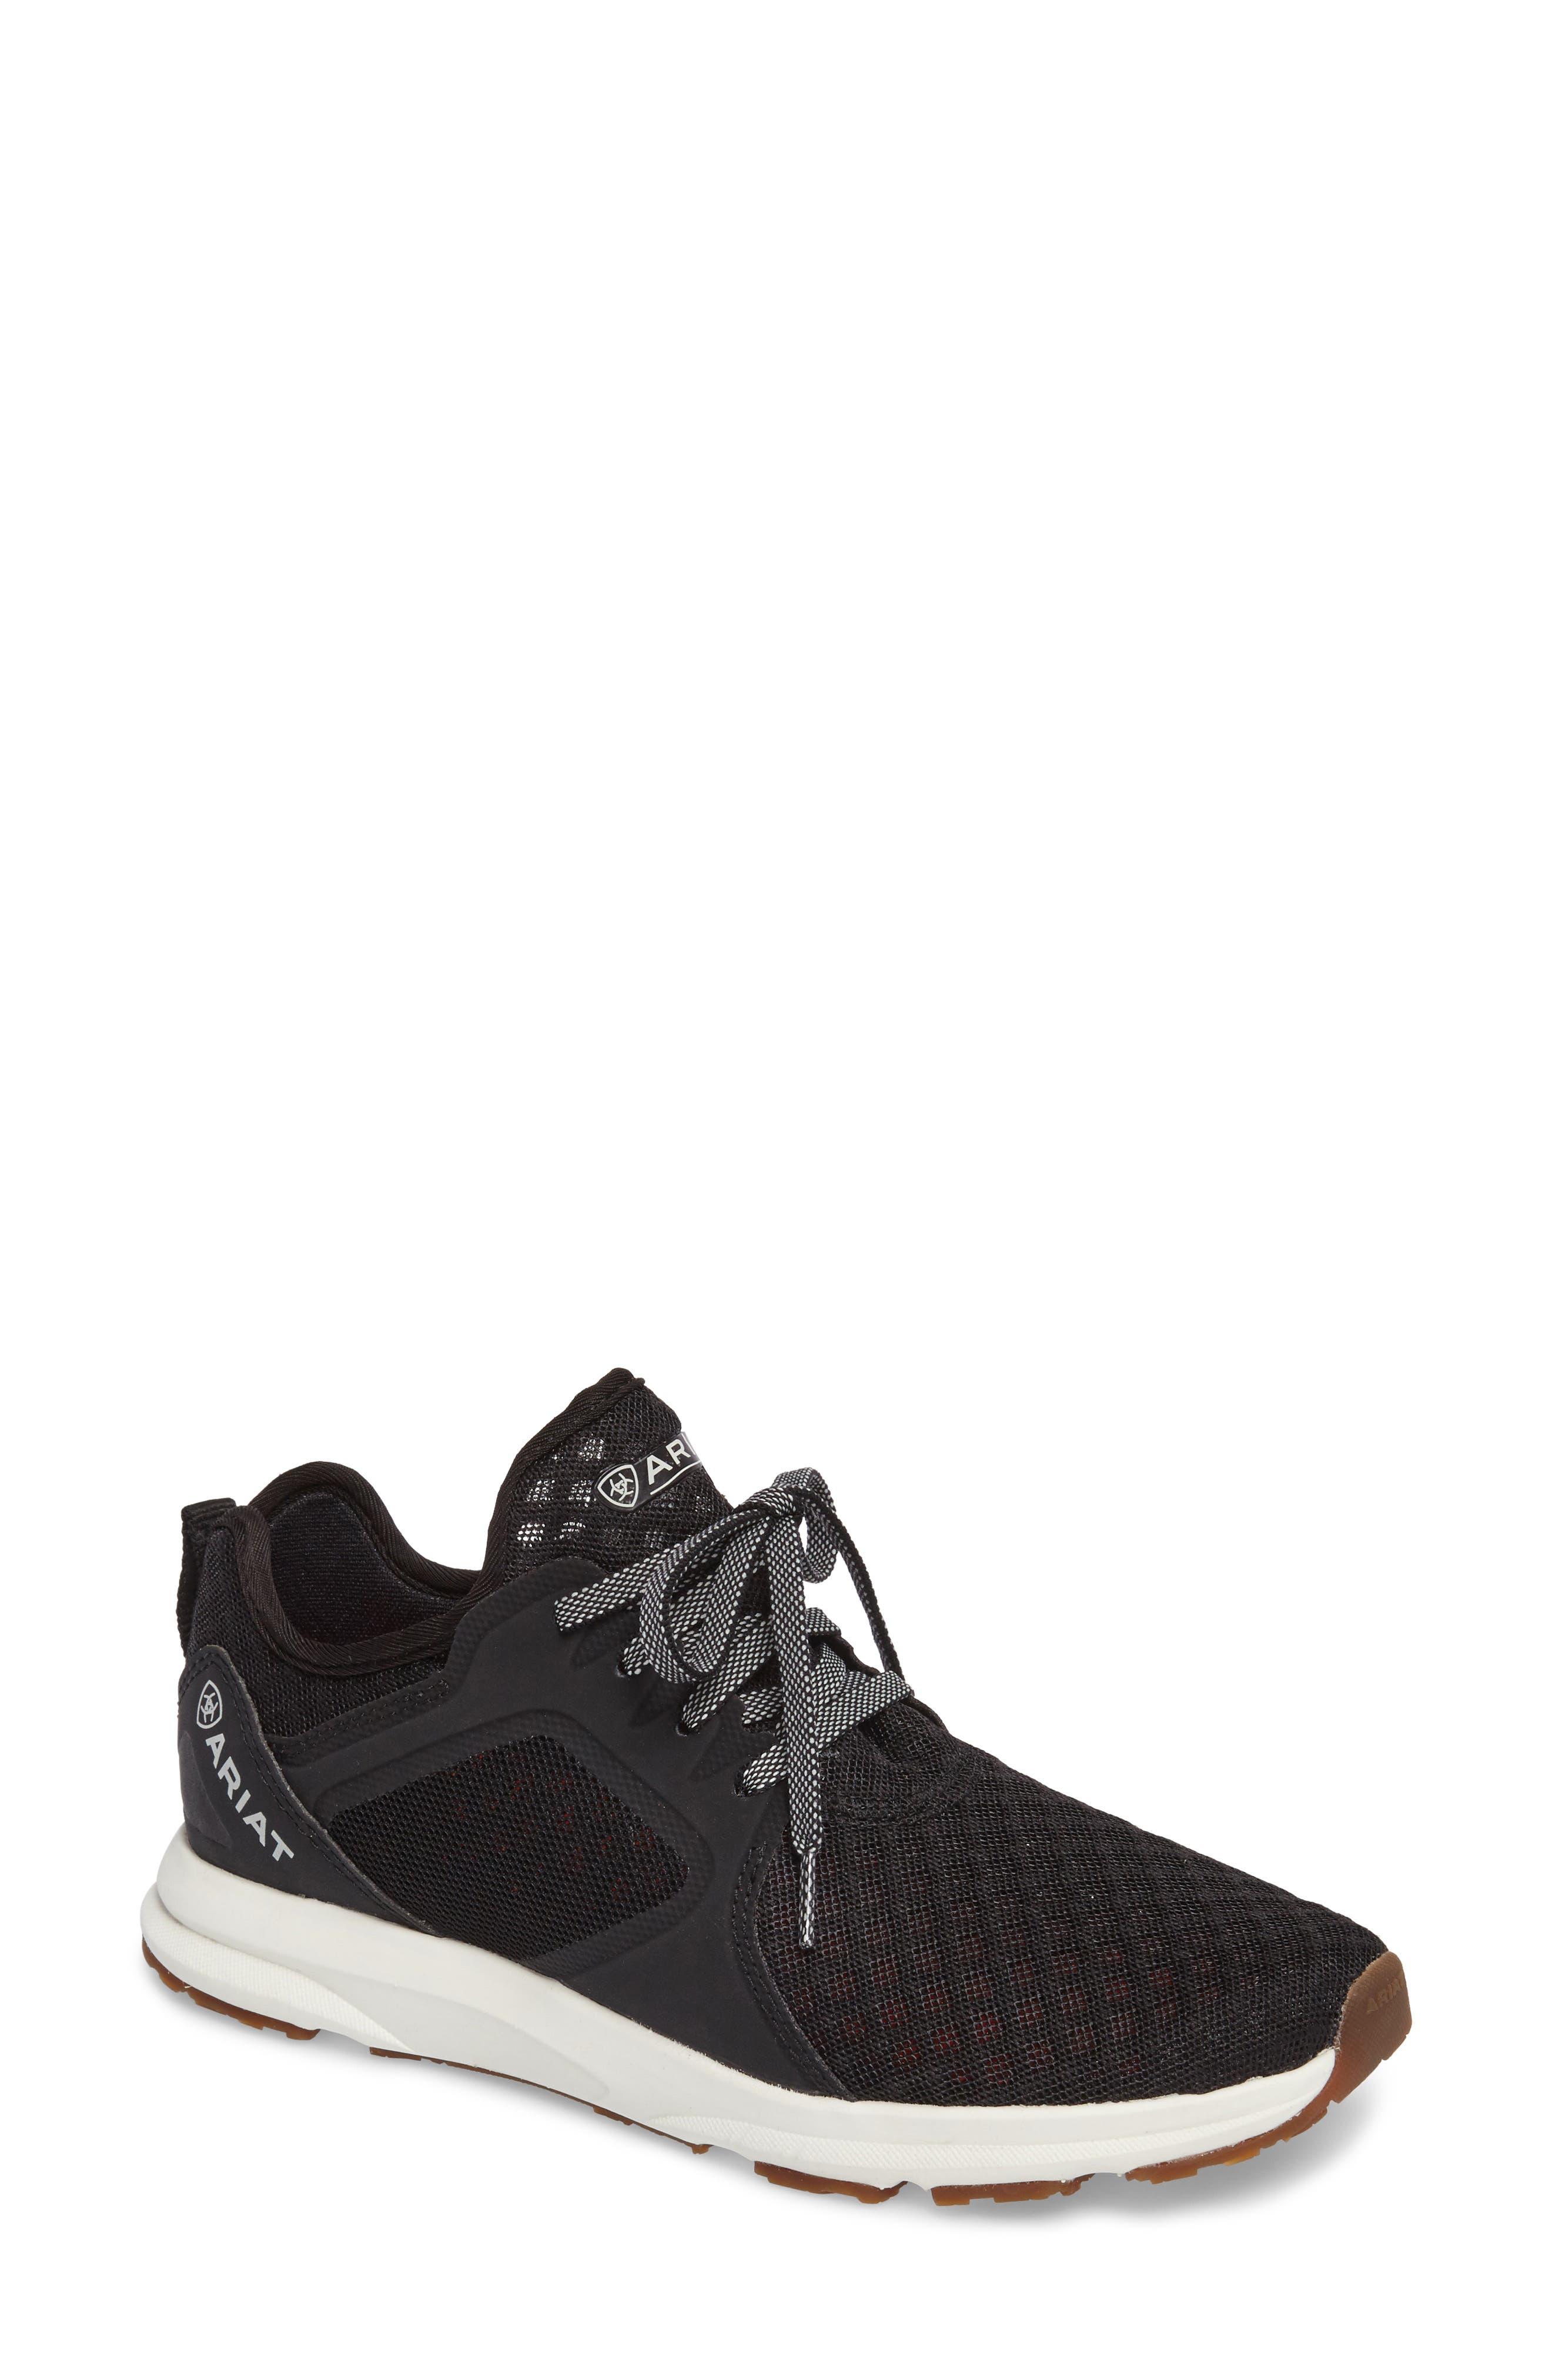 Fuse Sneaker,                         Main,                         color, 001